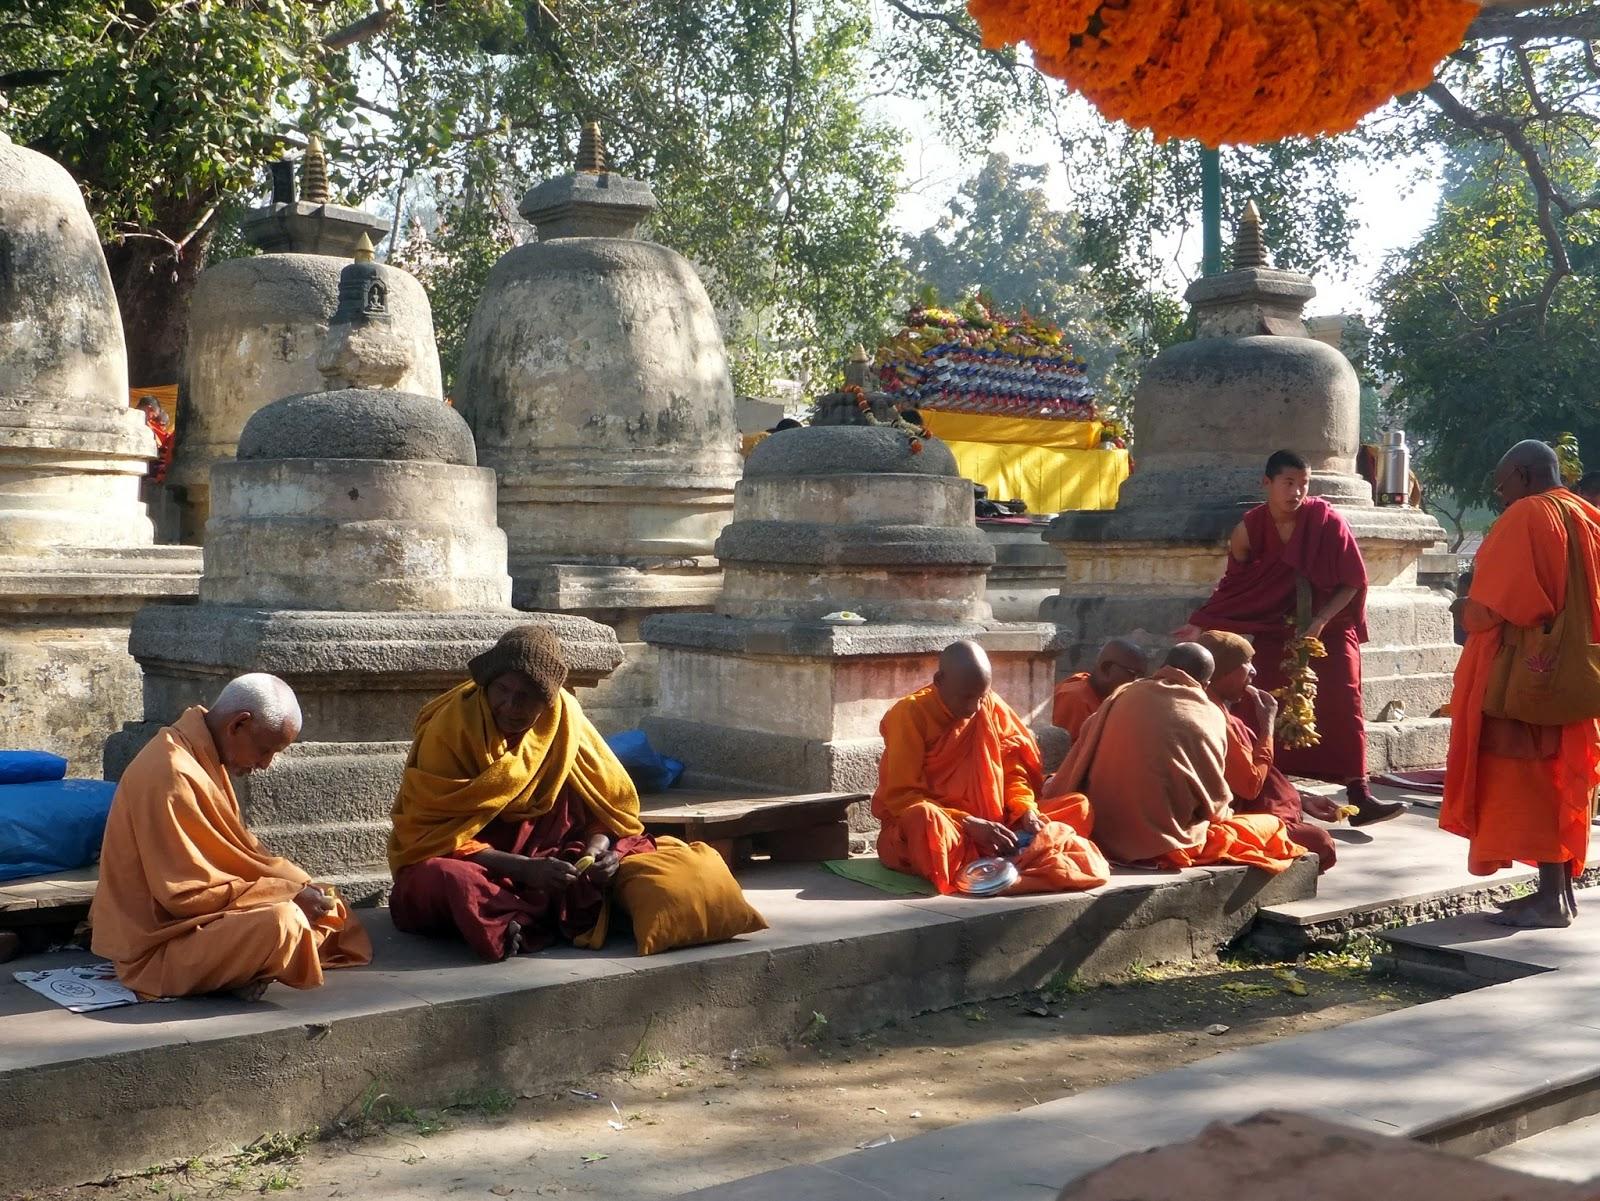 монахи на территории храма Махабоди в Бодхгае